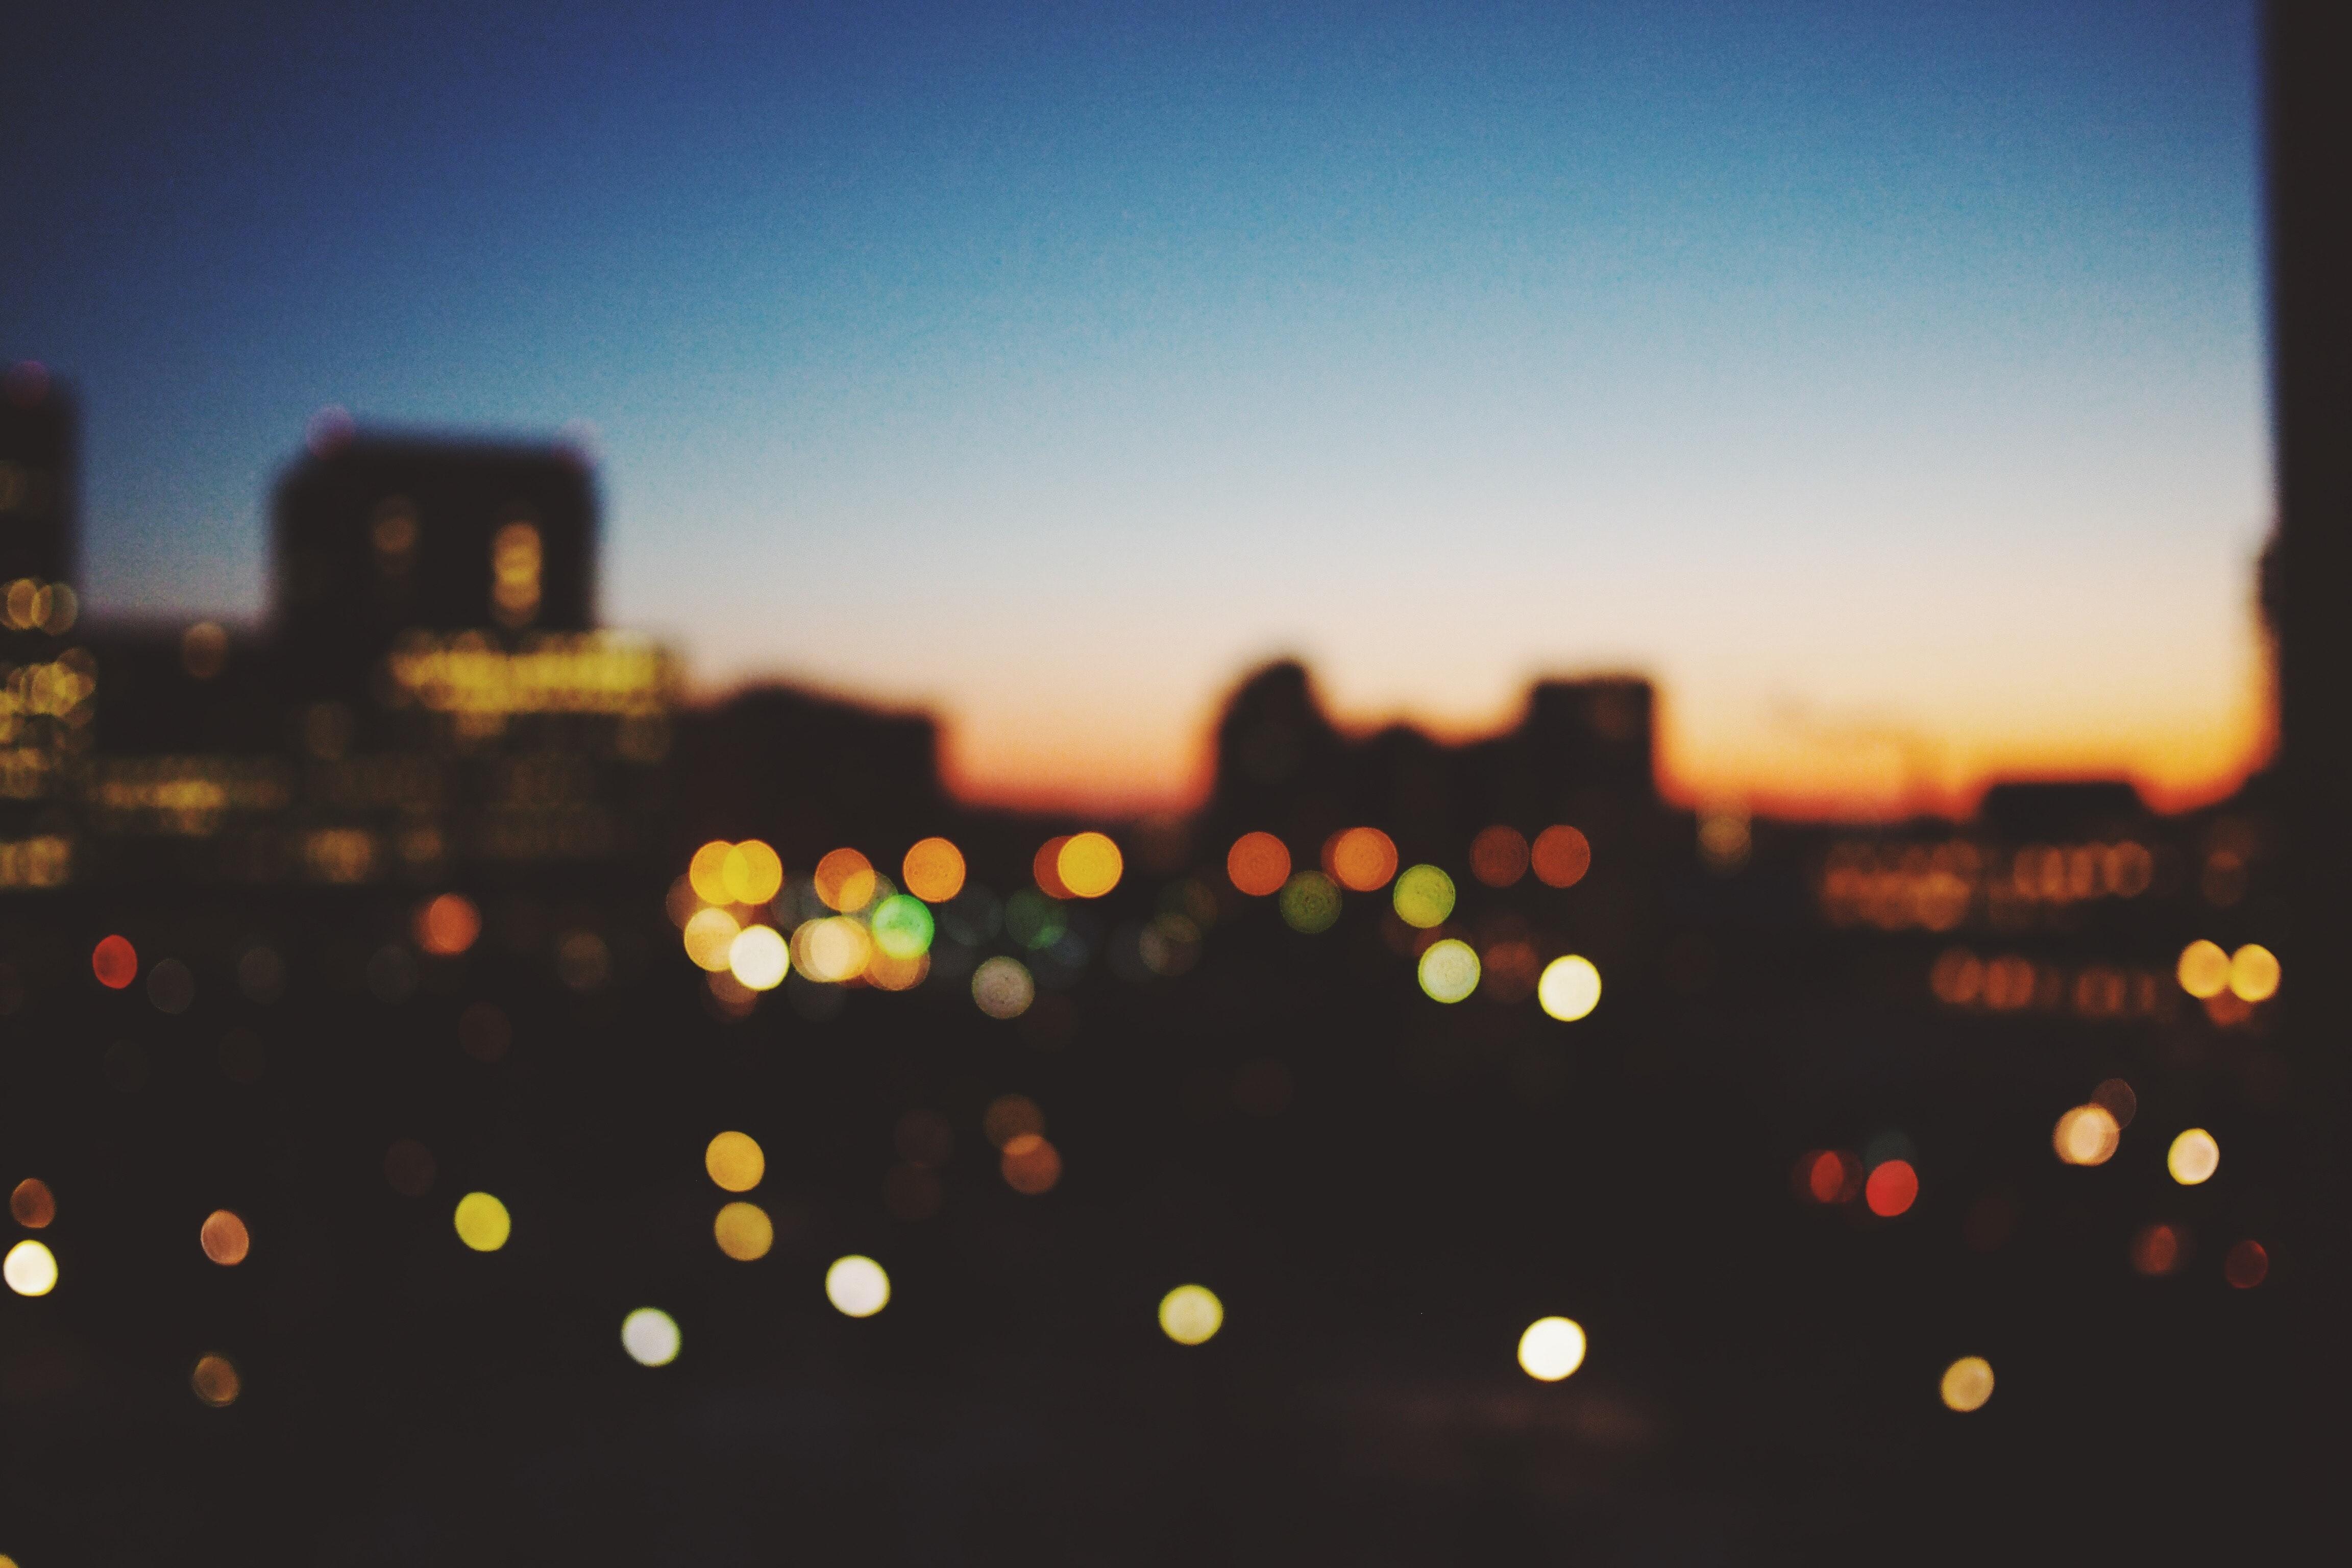 1000  Beautiful City Lights Photos · Pexels · Free Stock Photos for blurry city lights photography  45gtk